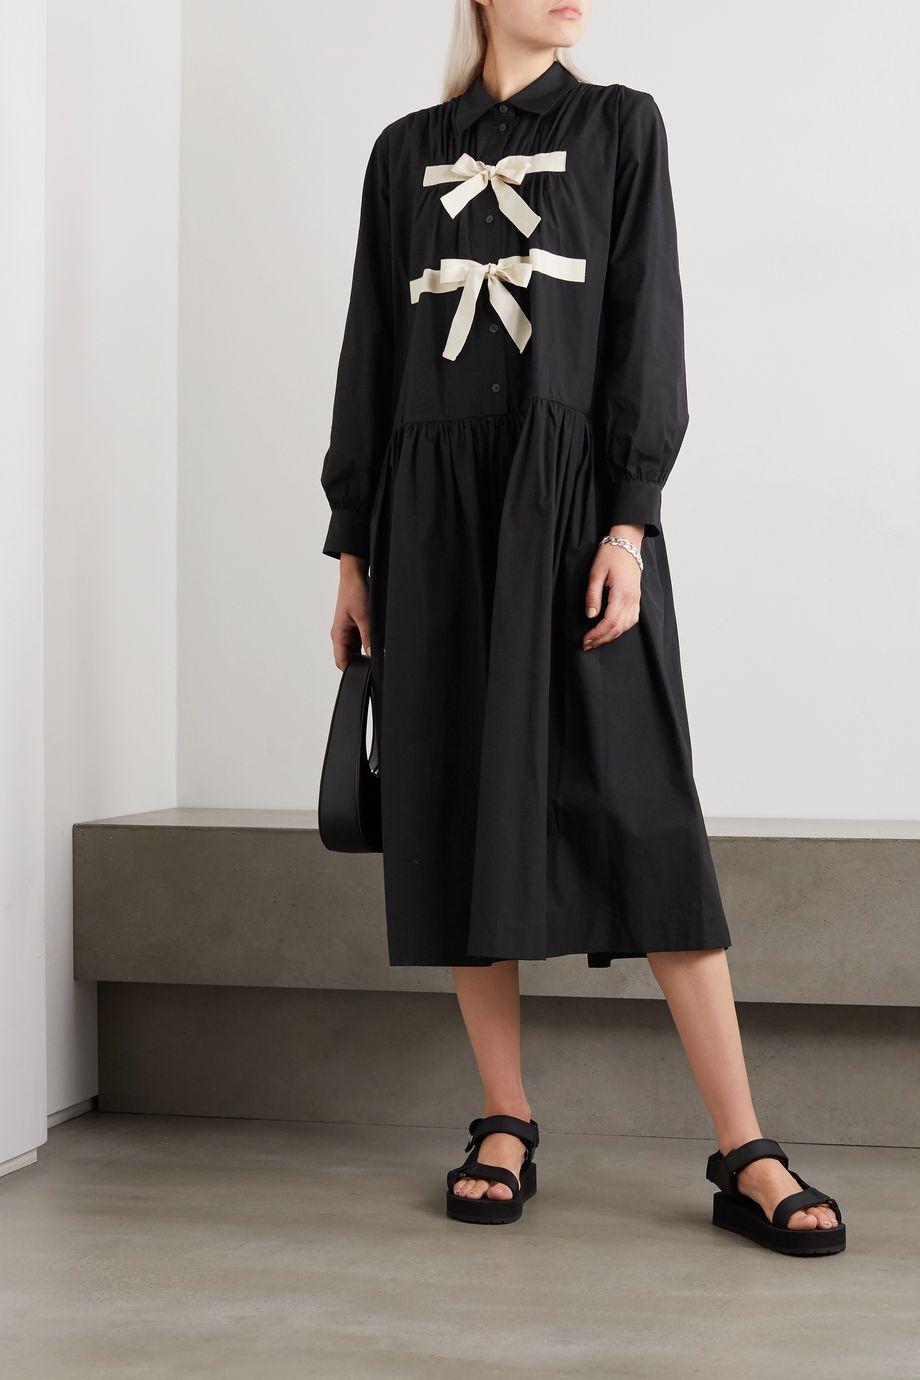 Molly Goddard Amber grosgrain-trimmed cotton-poplin midi dress